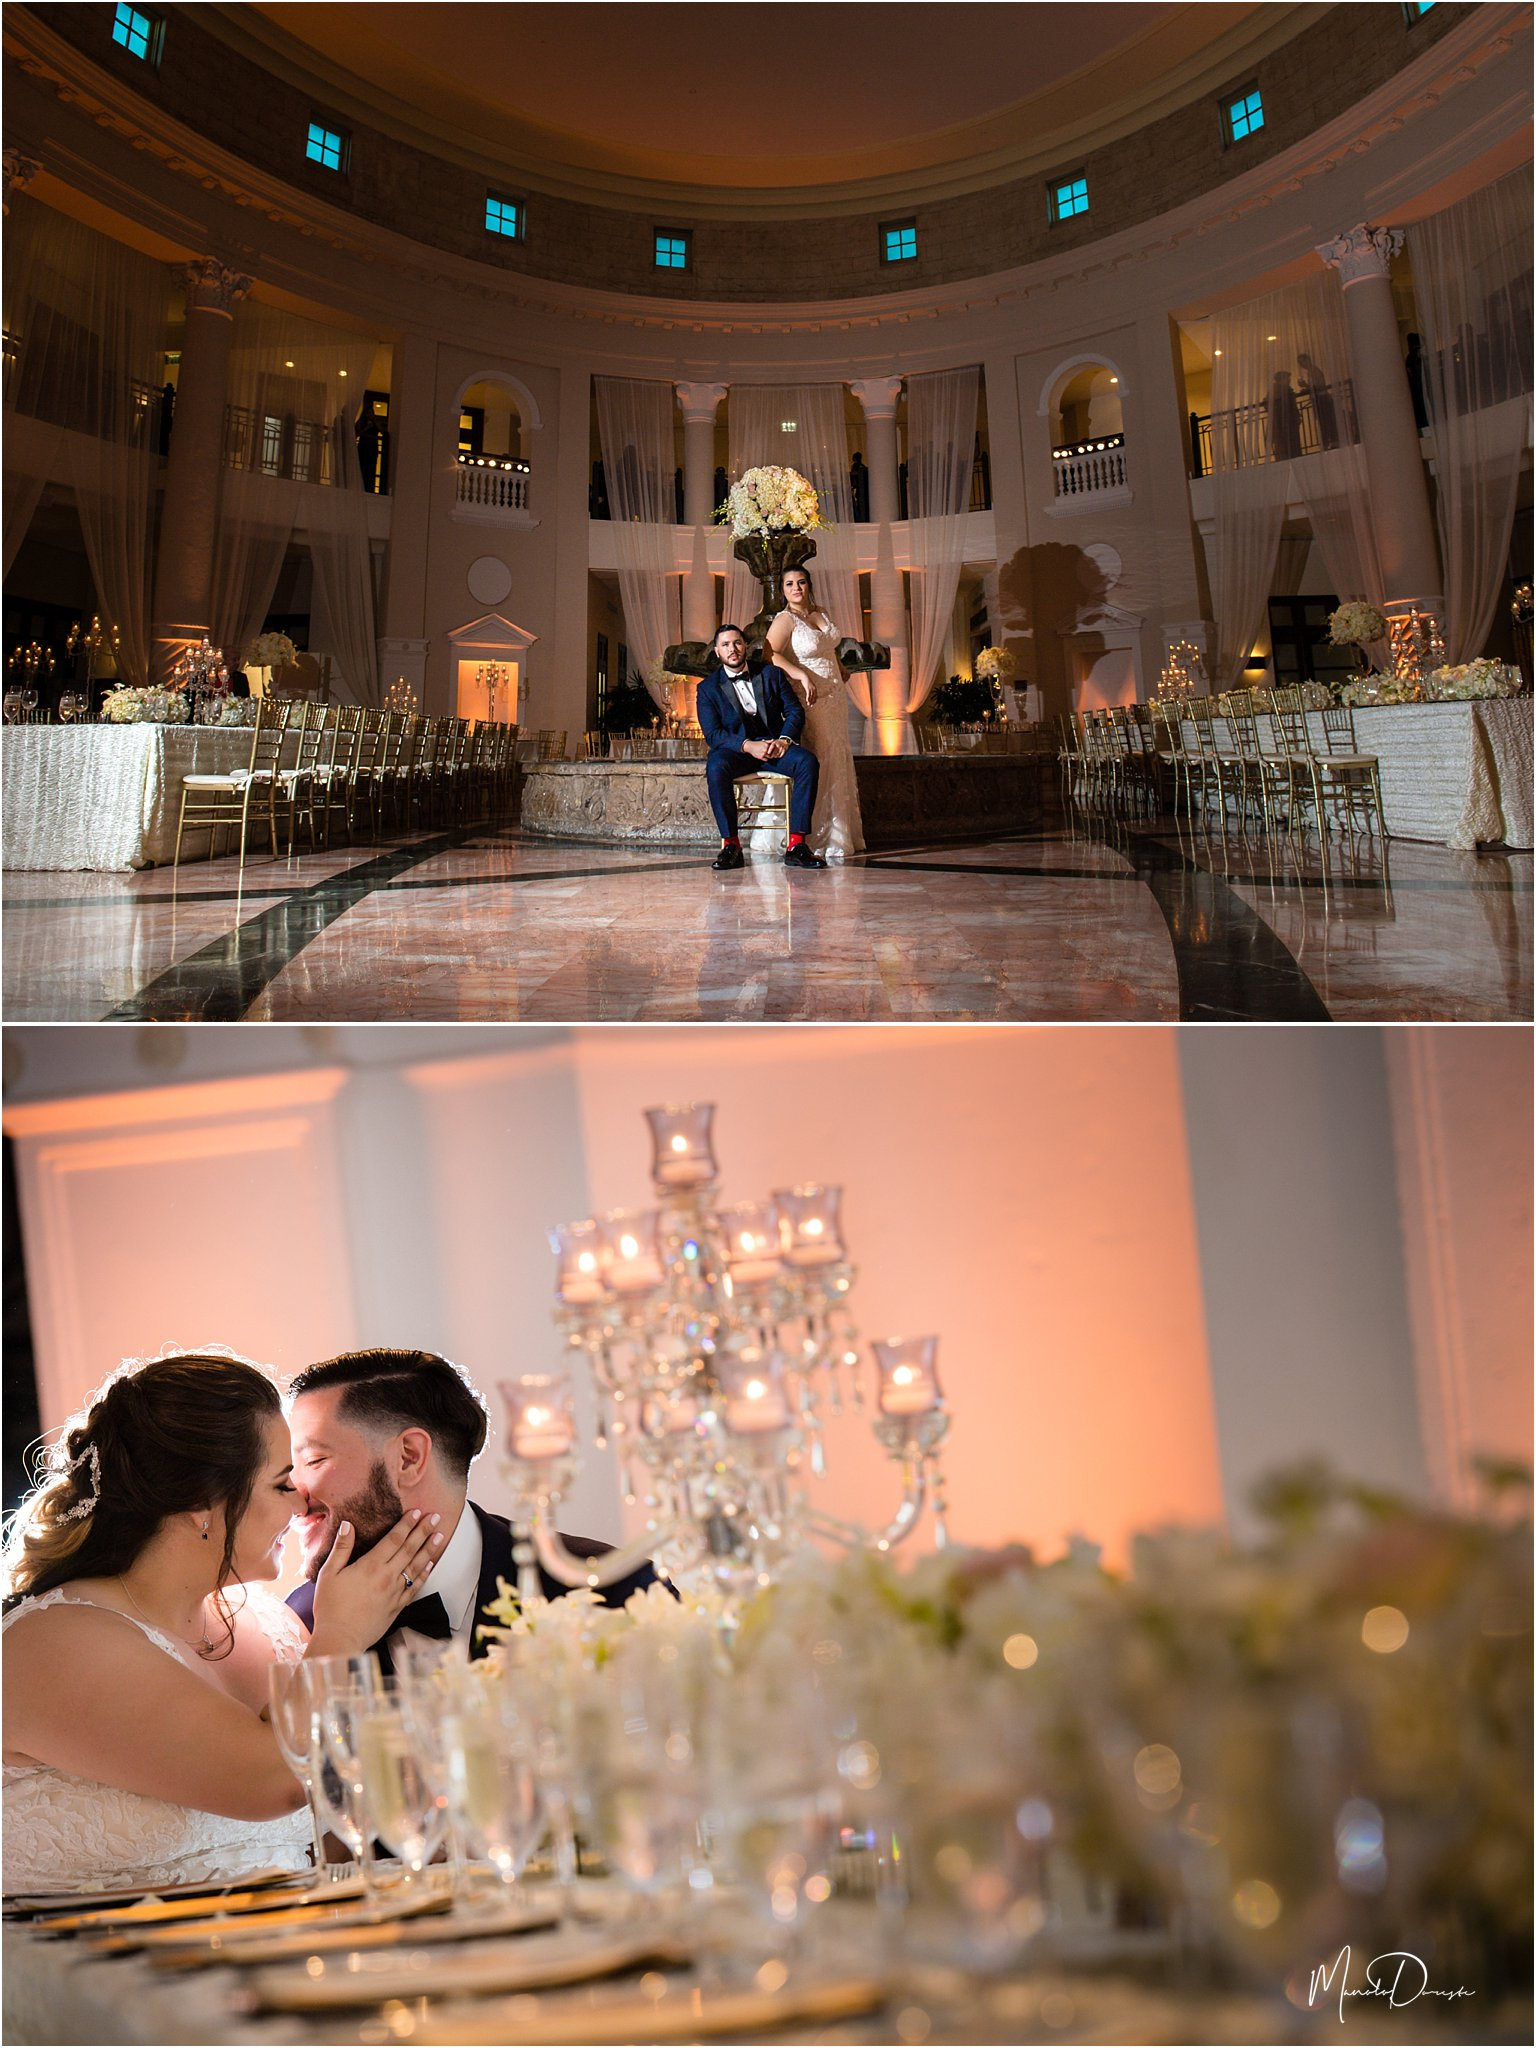 0373_ManoloDoreste_InFocusStudios_Wedding_Family_Photography_Miami_MiamiPhotographer.jpg